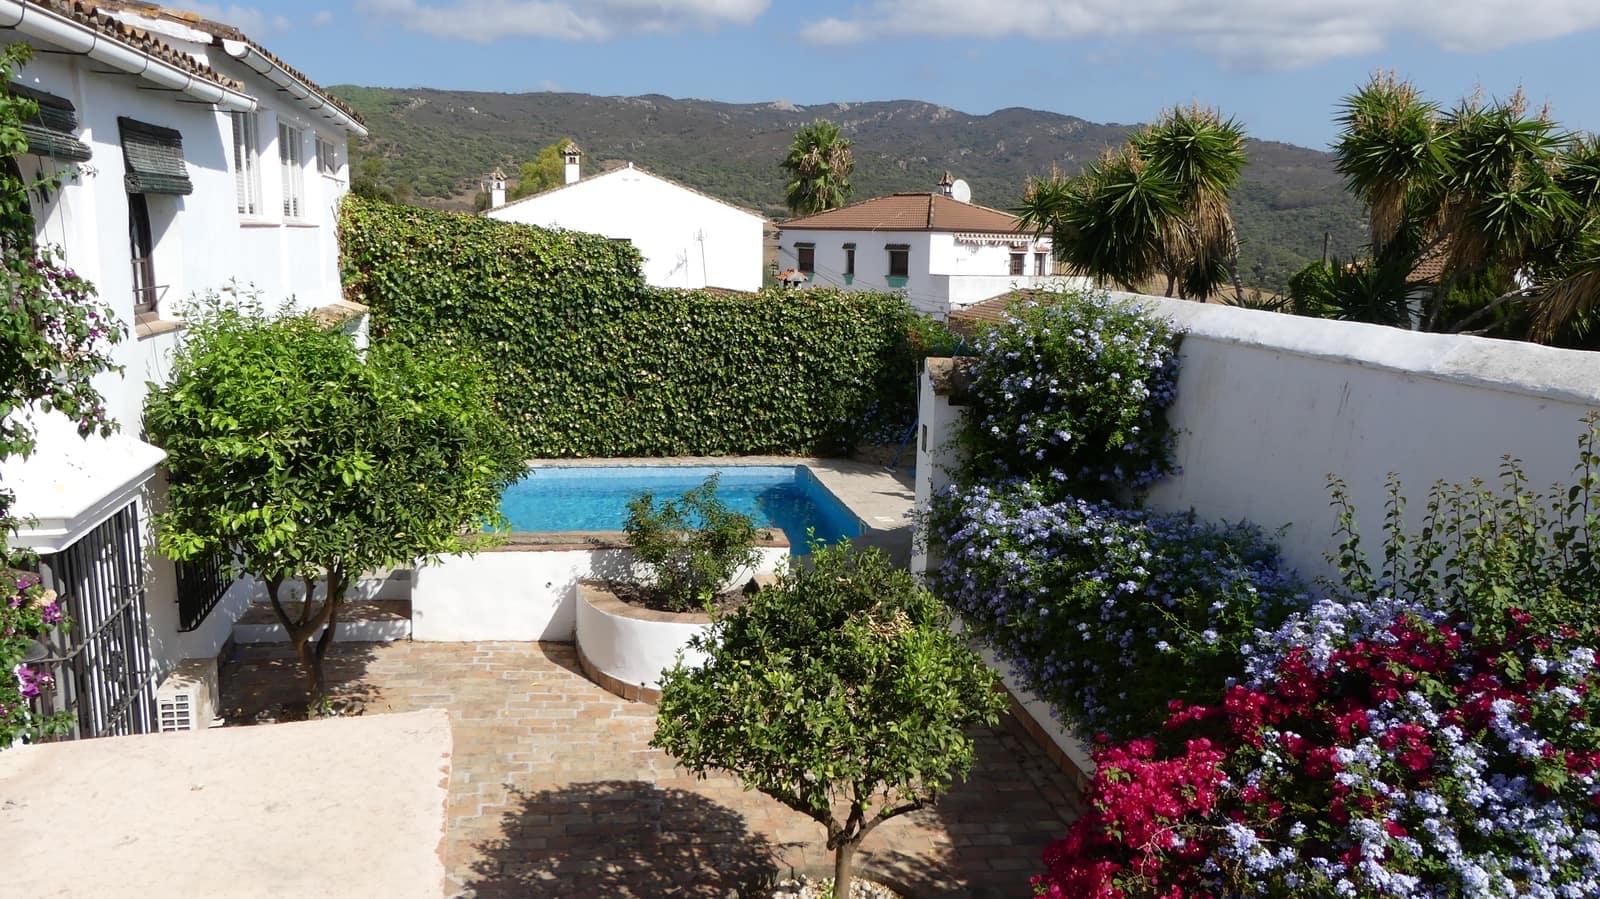 4 bedroom Townhouse for sale in Jimena de la Frontera - € 449,000 (Ref: 6319895)